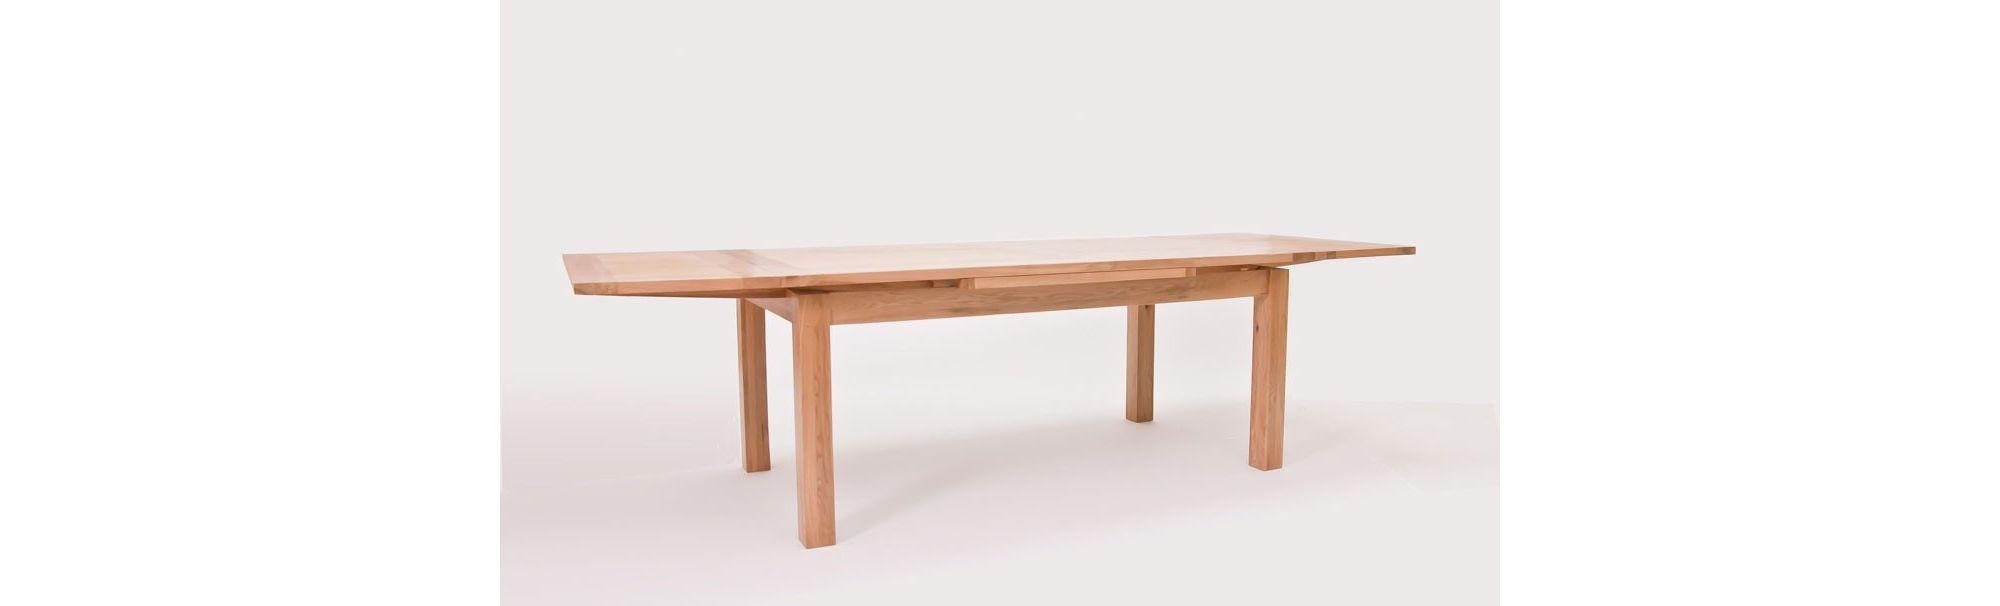 Extending Table 187 Tesco Extending Tables : 468 0215PI1000015MNwid2000amphei2000 from extendingtable.co.uk size 2000 x 2000 jpeg 41kB